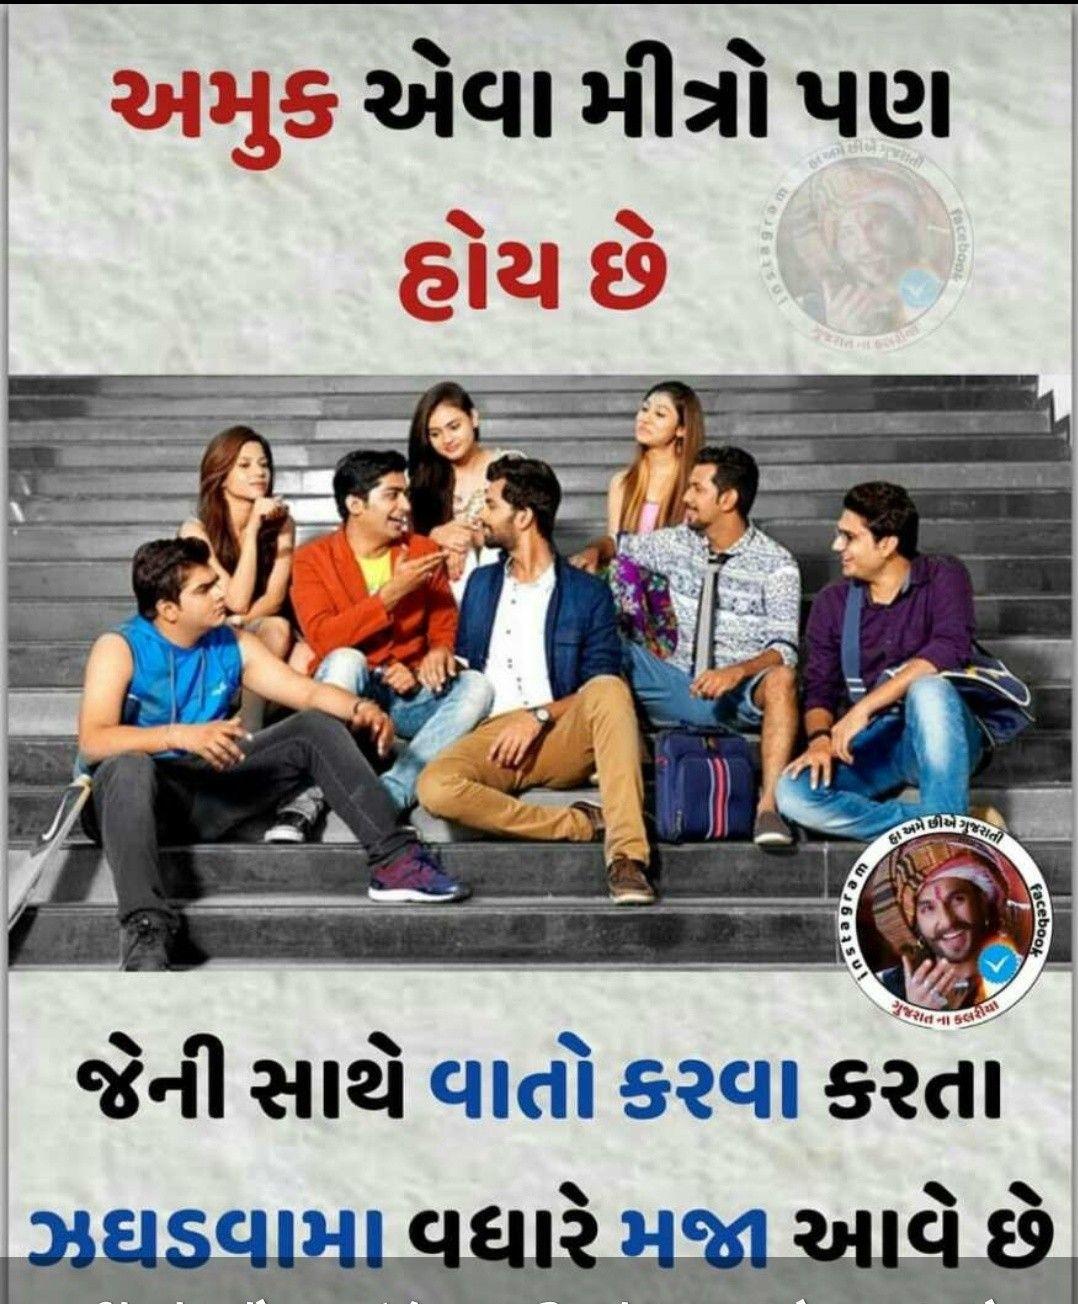 Funny Friendship Shayari In Gujarati : funny, friendship, shayari, gujarati, Jayesh, Rathod, Friend, Quotes, Girls,, Friends, Quotes,